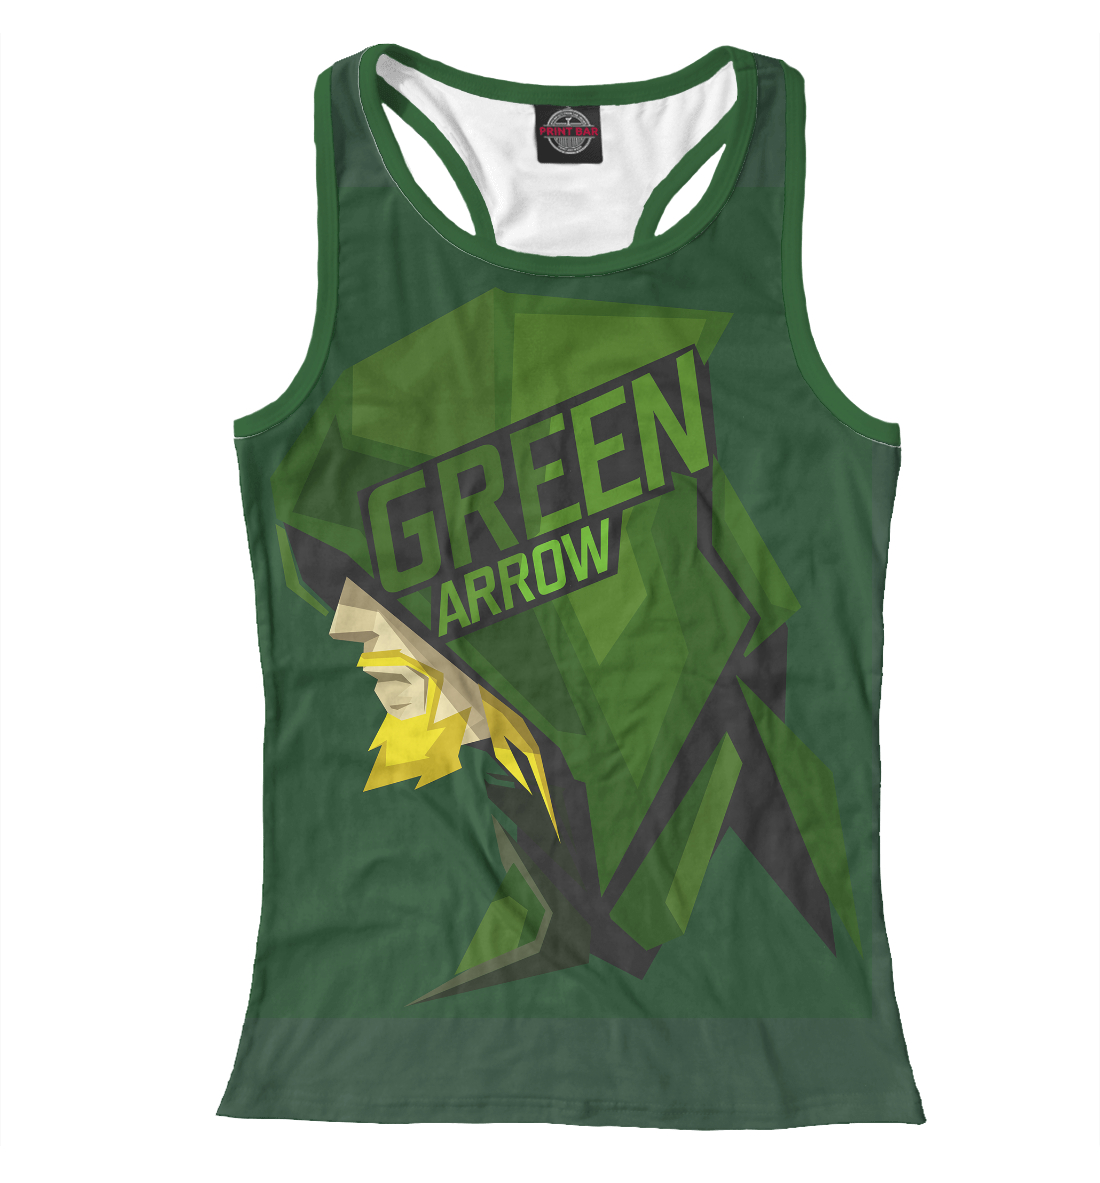 Green Arrow, Printbar, Майки борцовки, STR-984290-mayb-1  - купить со скидкой